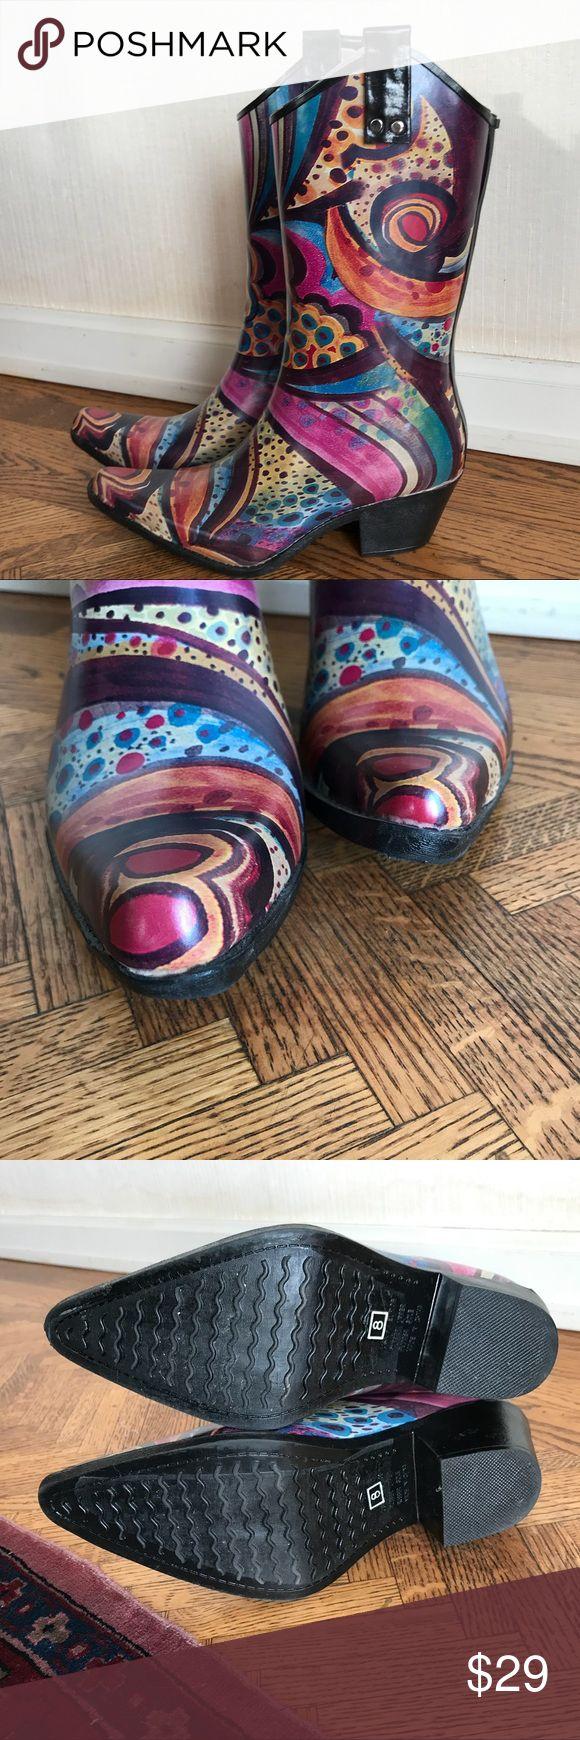 Nomad rain boot Monet pattern western rubber rain boot. Nomad Footwear Shoes Winter & Rain Boots